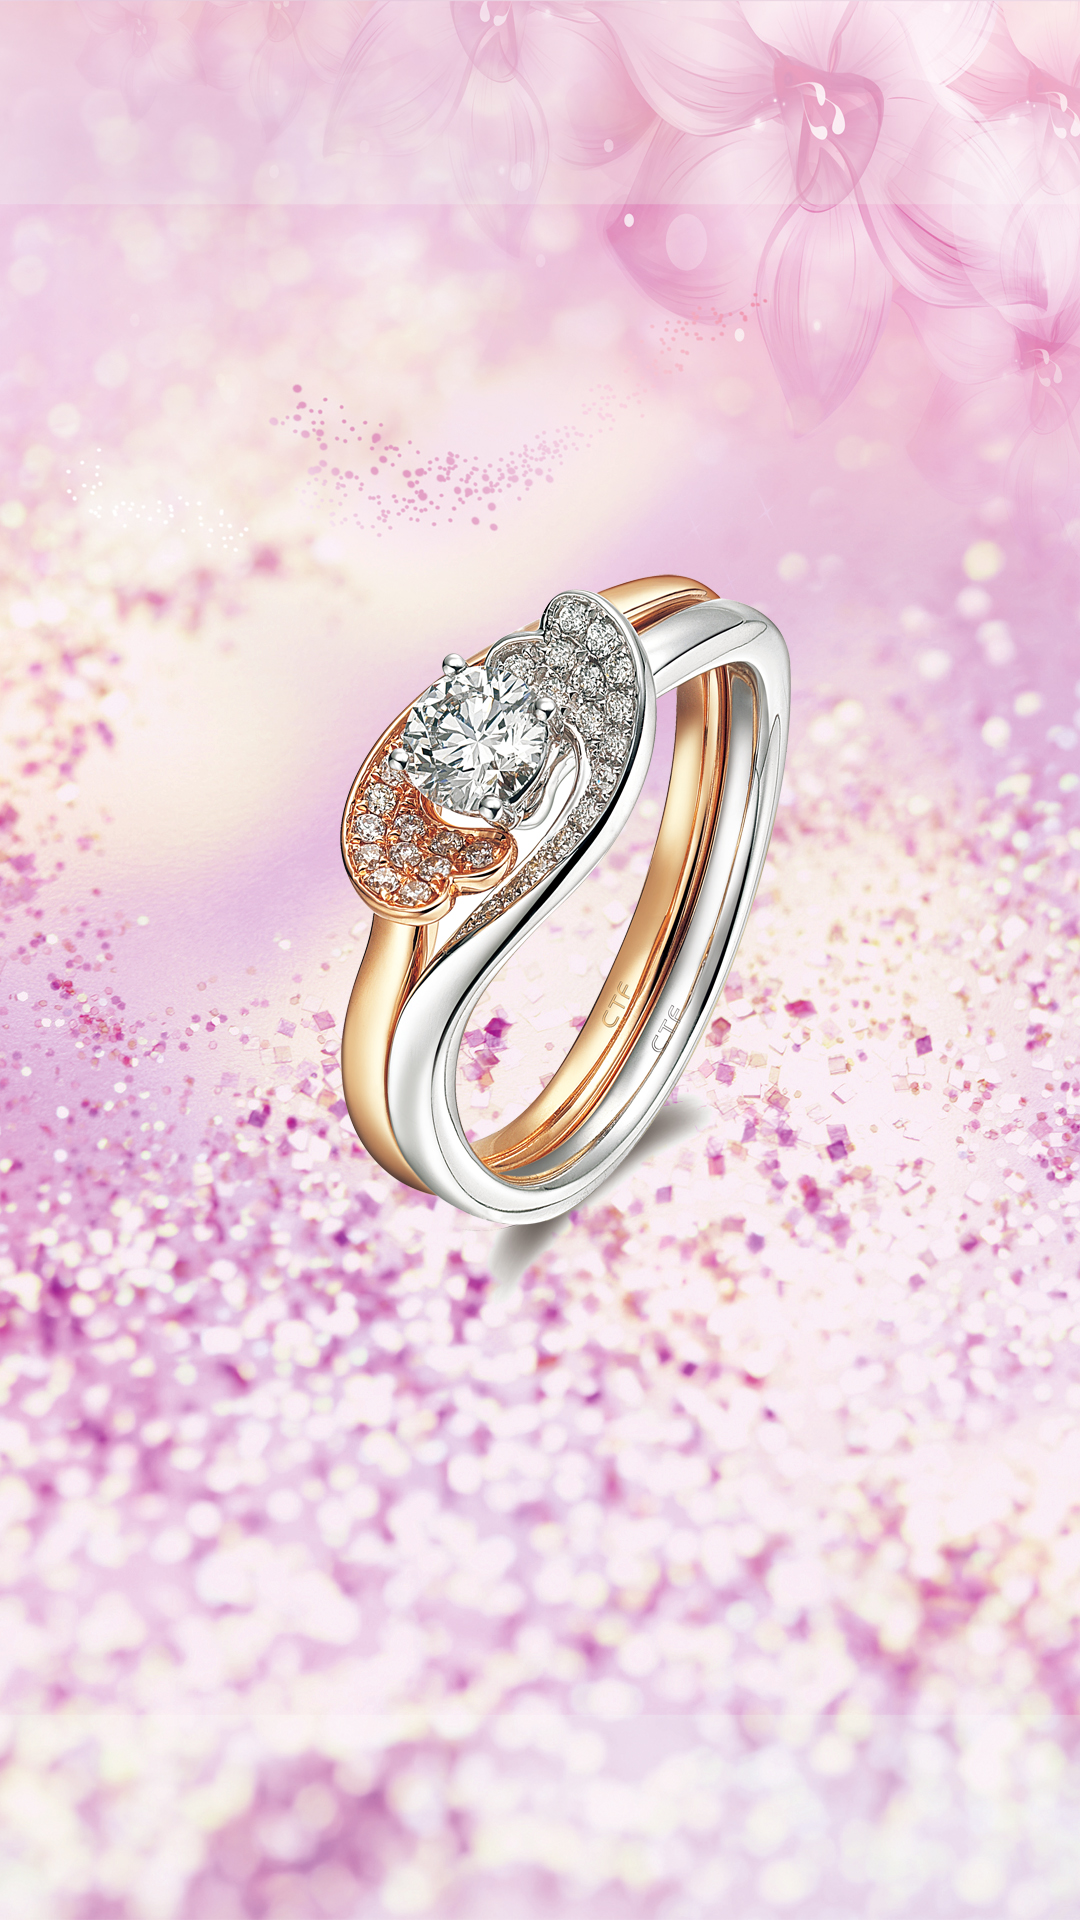 Bangle Ring Wedding Symbol Background, Love, Rings, Decoration ...